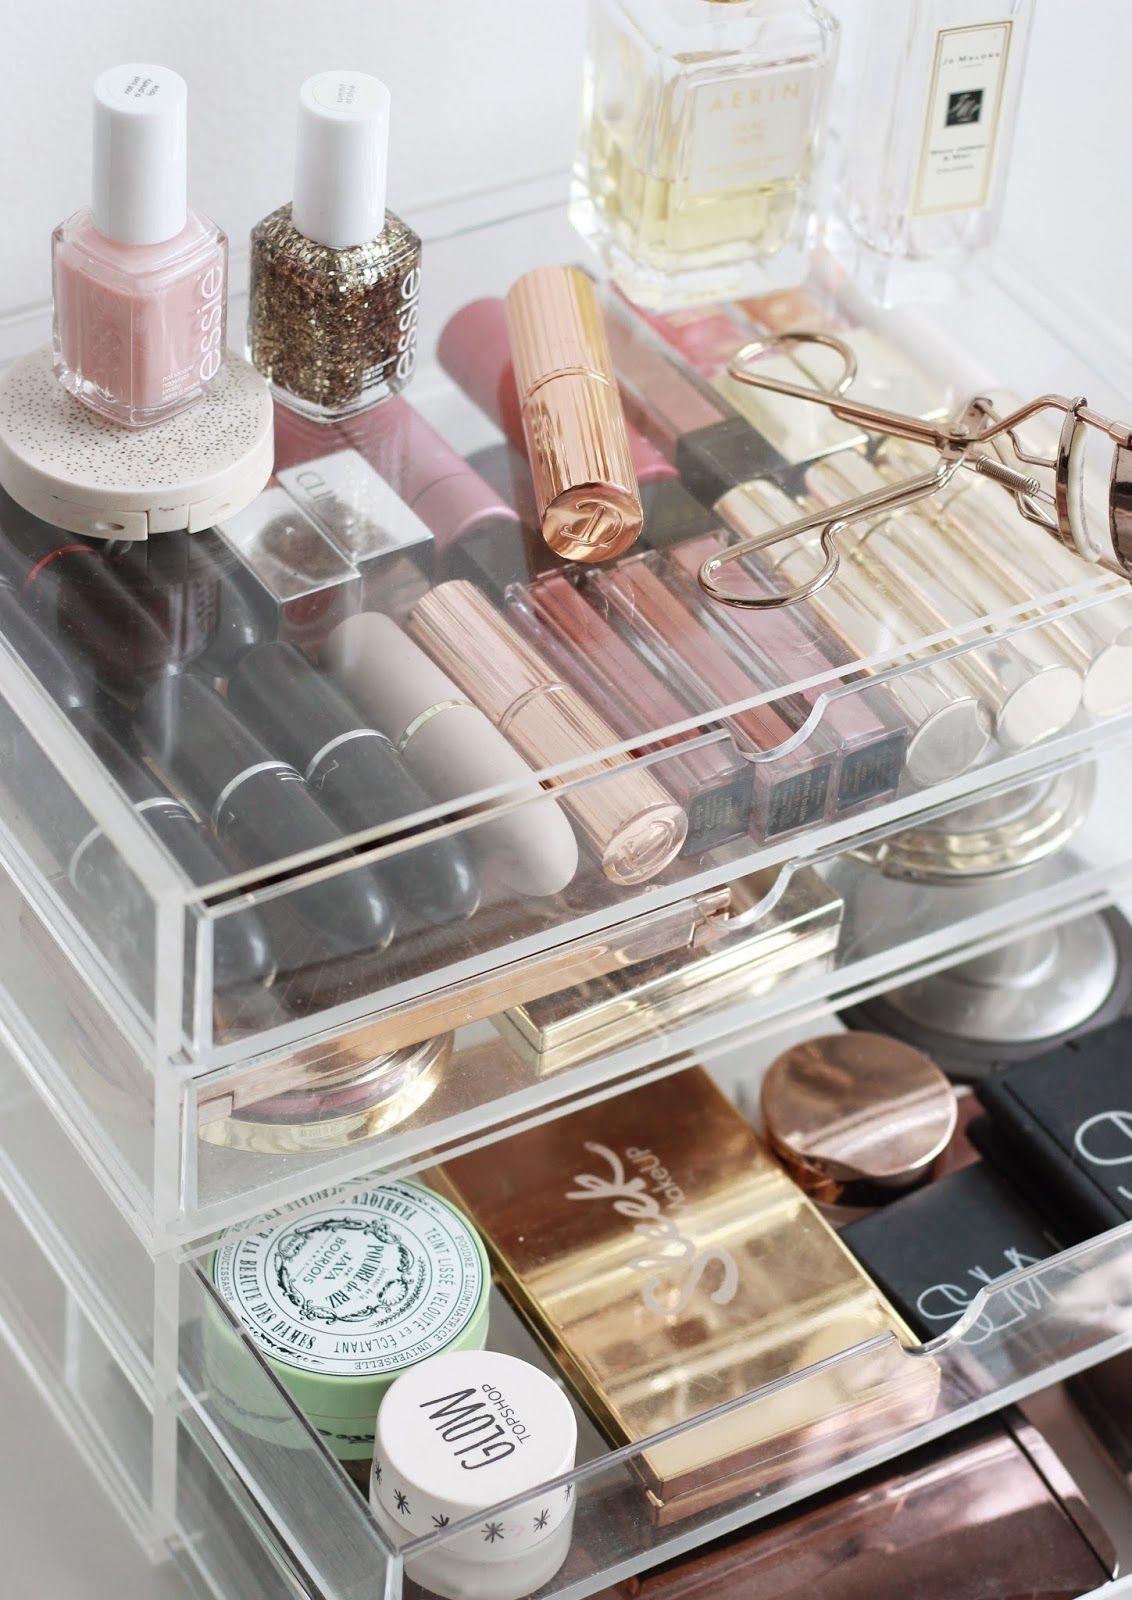 A Muji Makeup Storage Overhaul Muji makeup storage